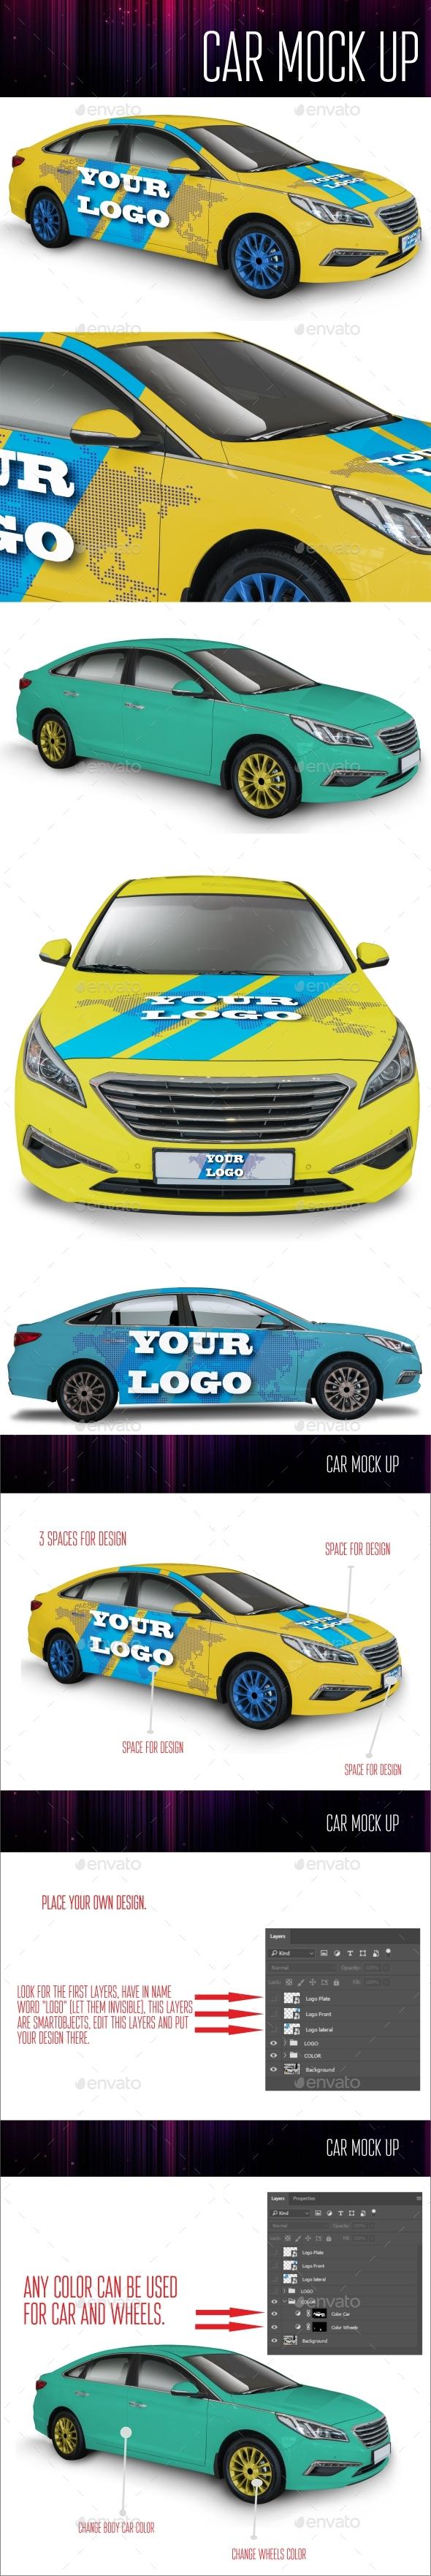 Car Mock Up - Product Mock-Ups Graphics